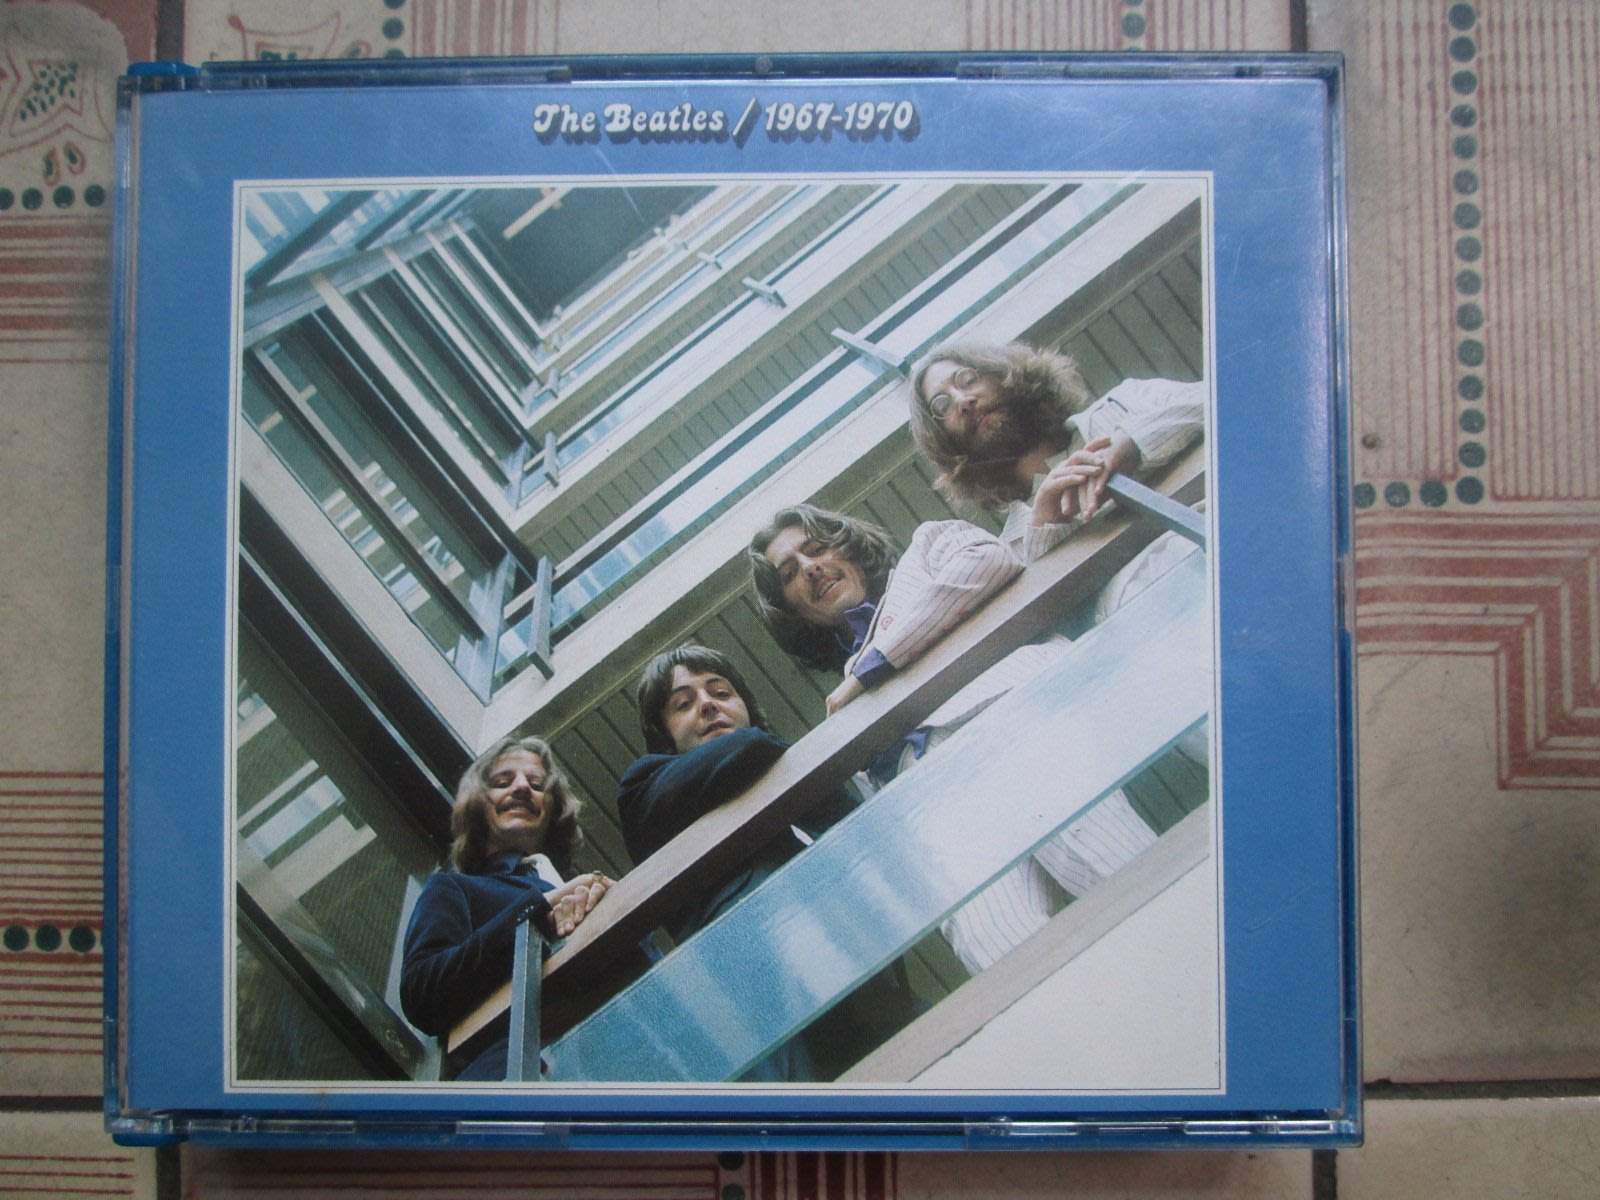 進口CD(2CD.缺第1張)~The Beatles--1967-70 Hits專輯.收錄Let It Be等